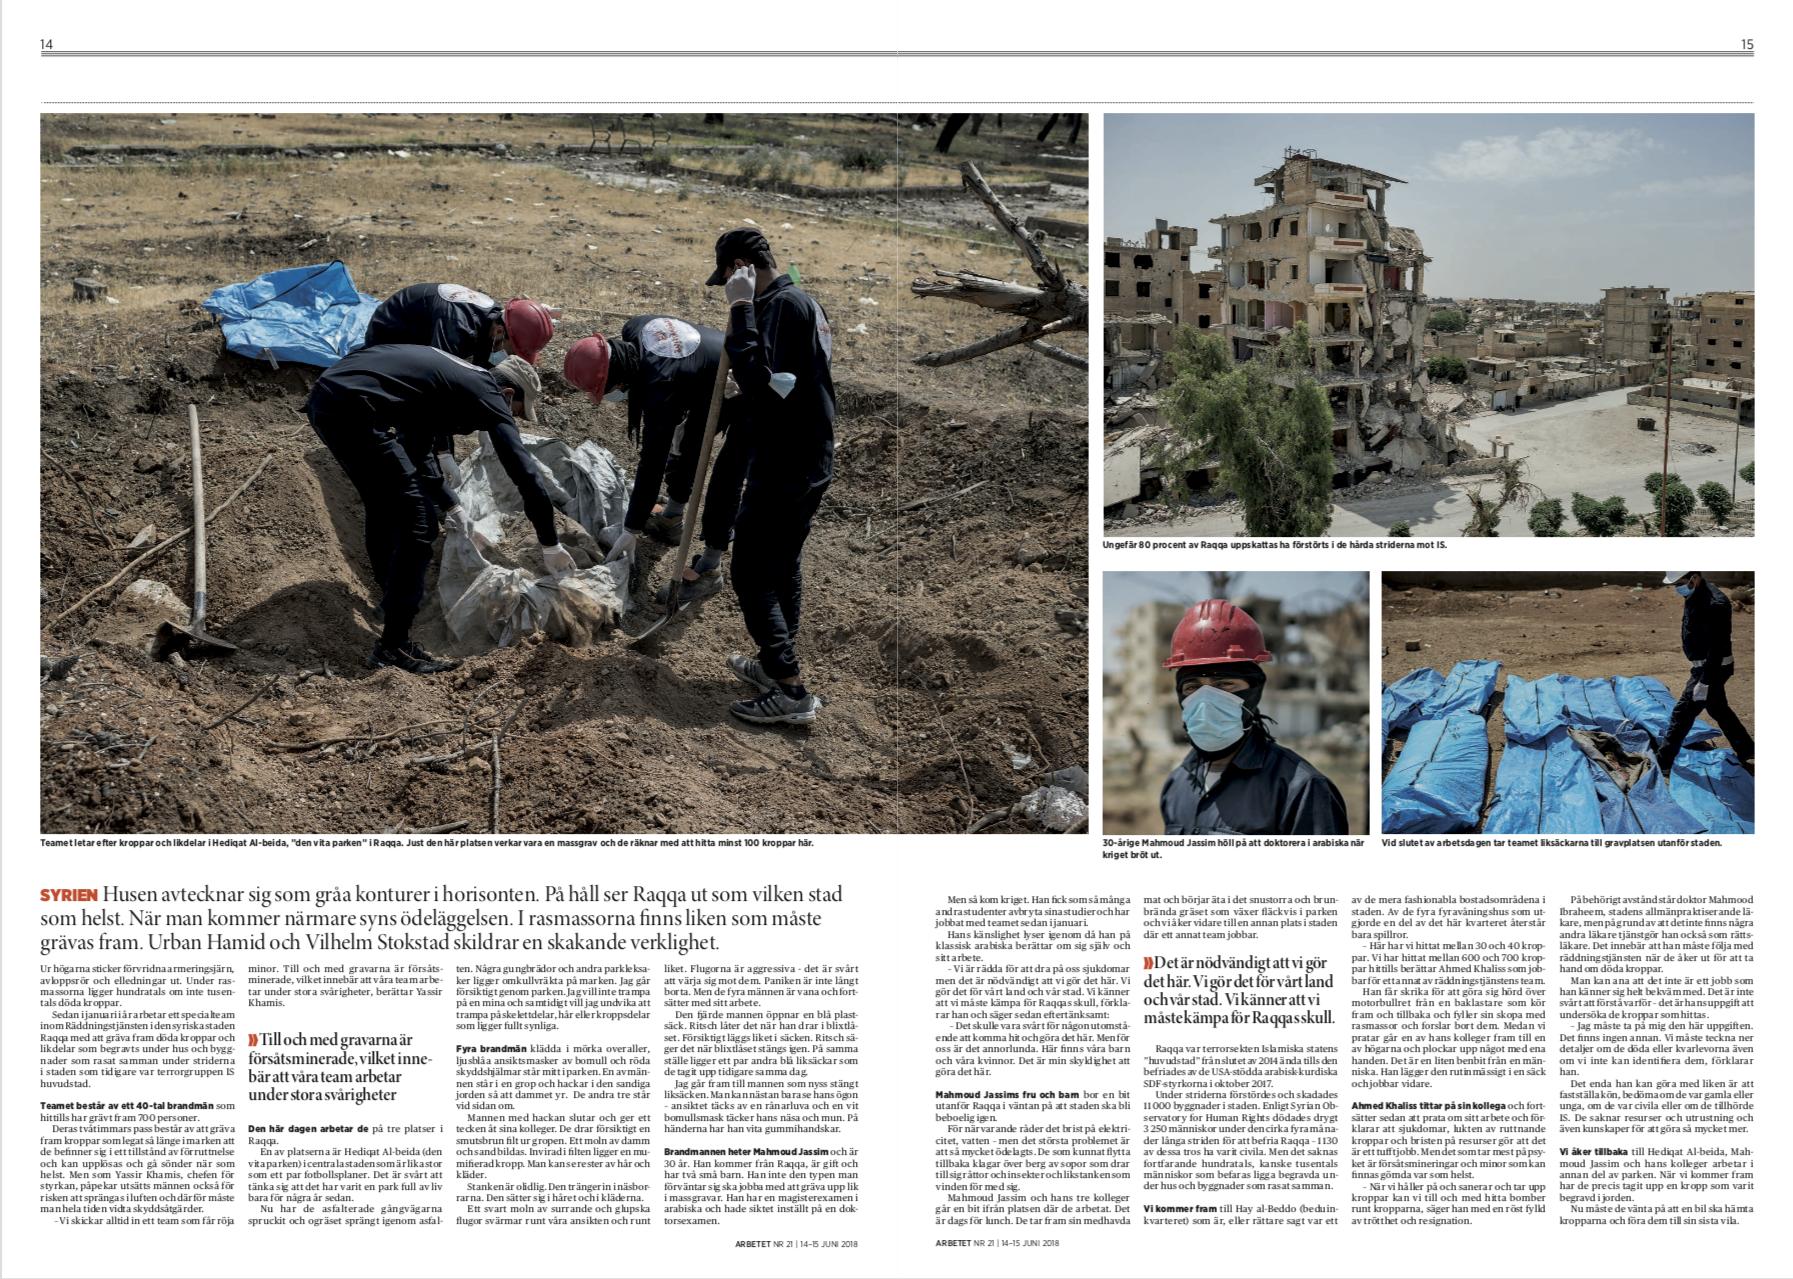 Gravediggers of Raqqa, Arbetet, 2018.